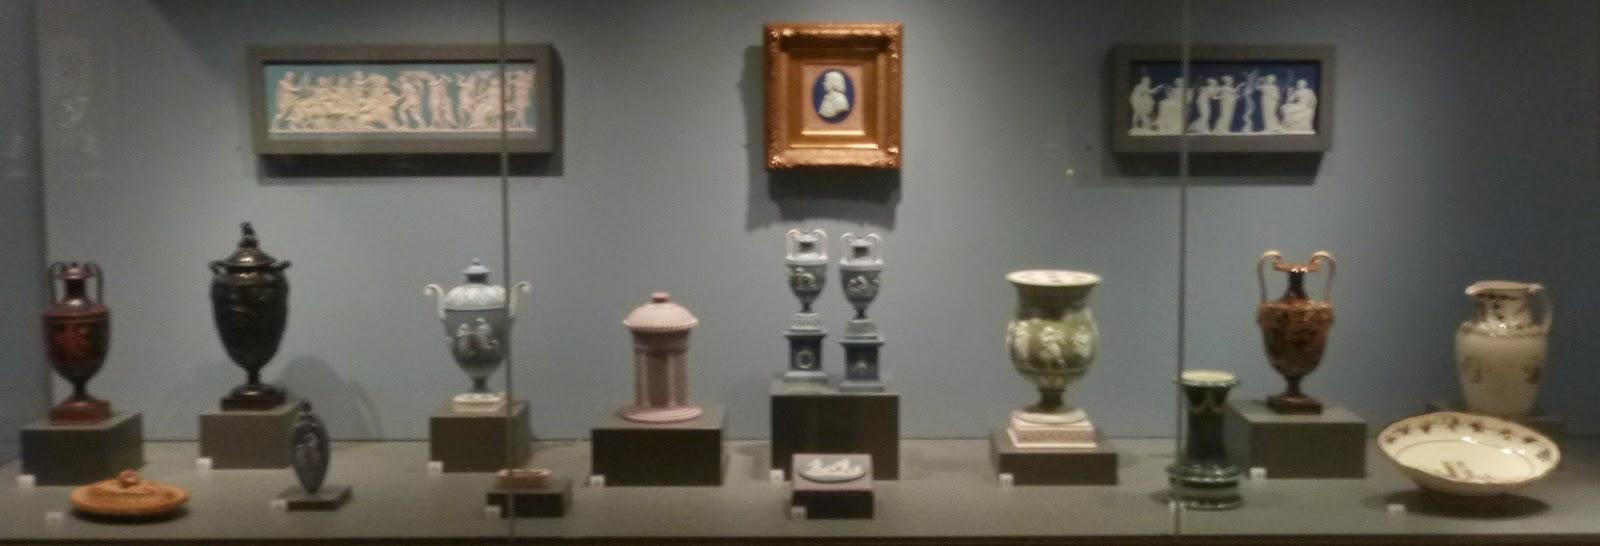 Wedgewood Vases